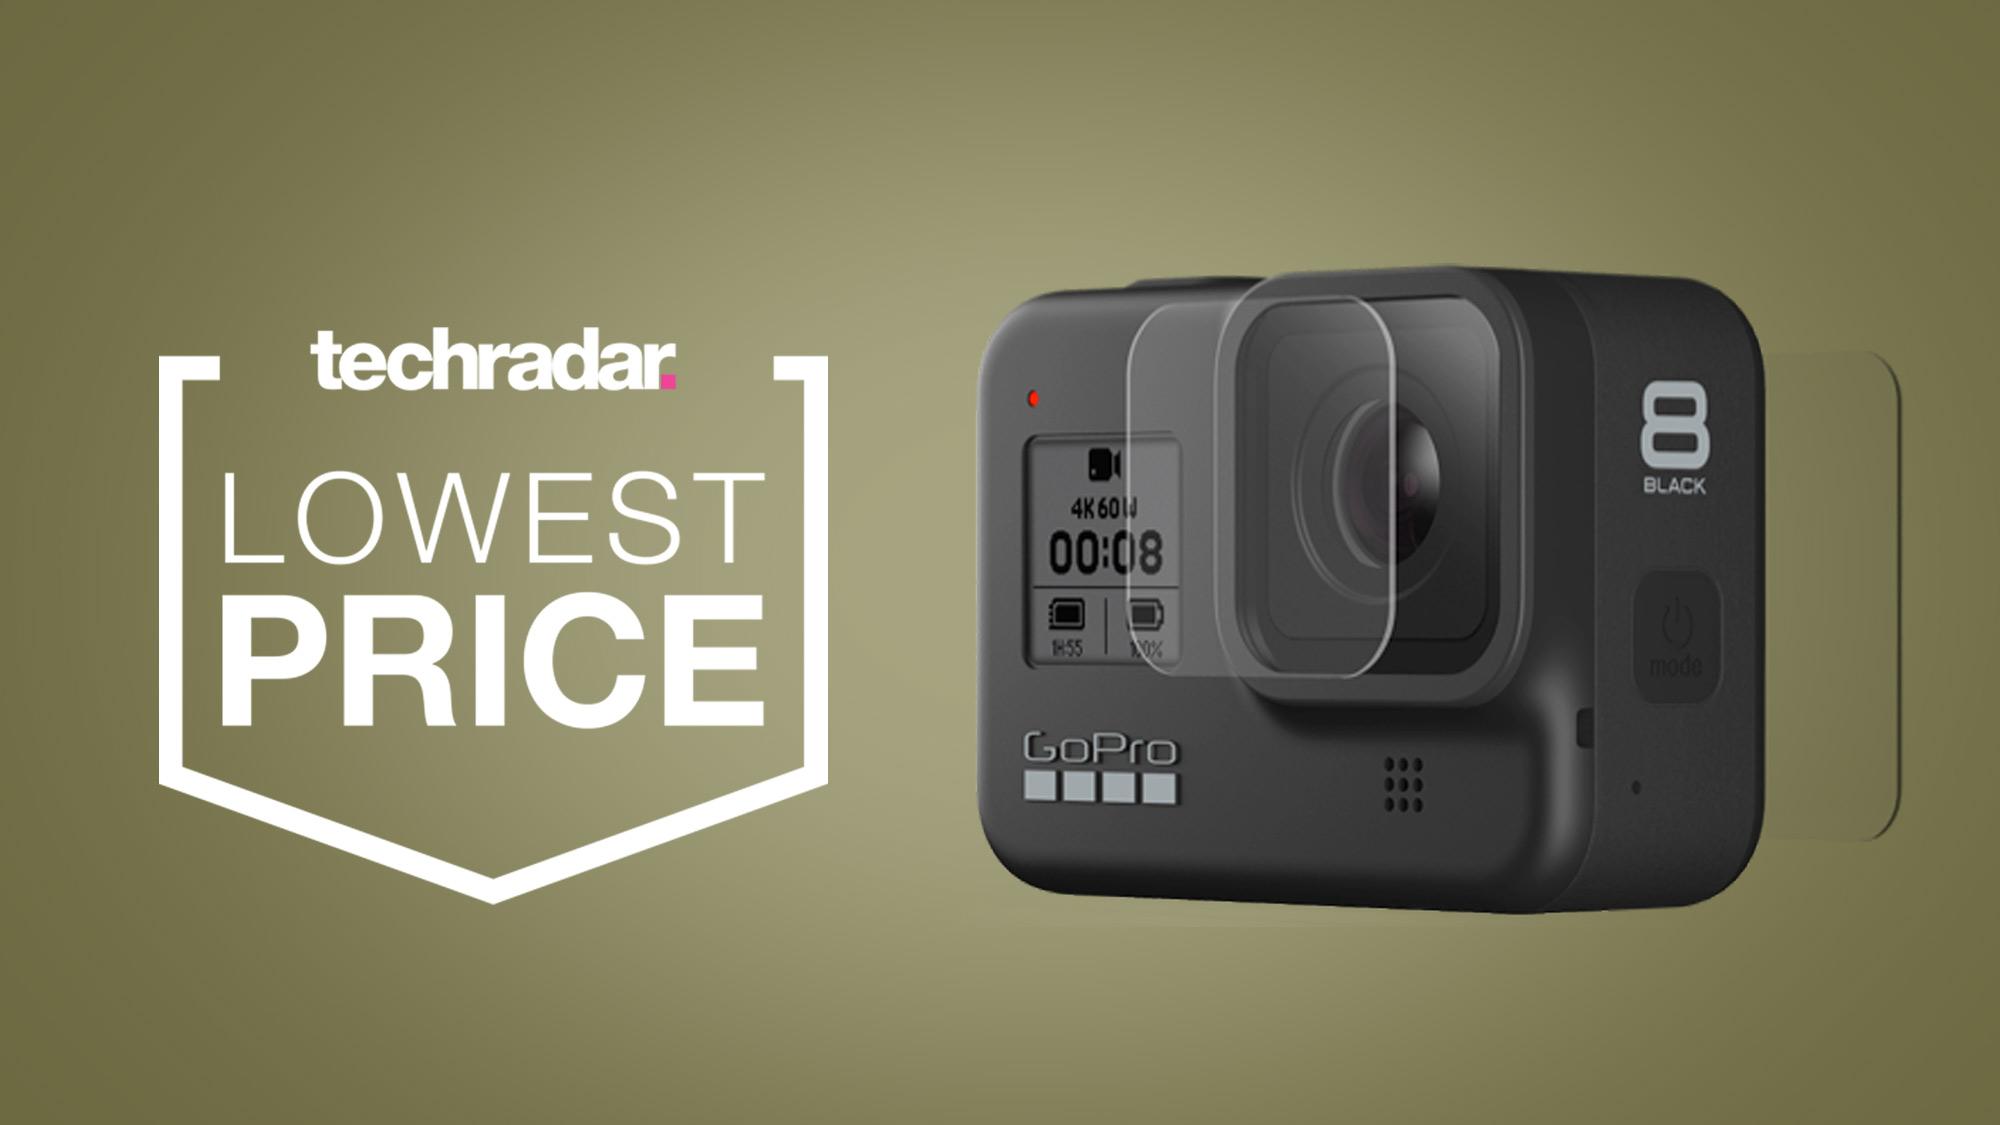 Gopro Hero 8 Black Back Down To Its Lowest Price Yet At Best Buy Techradar